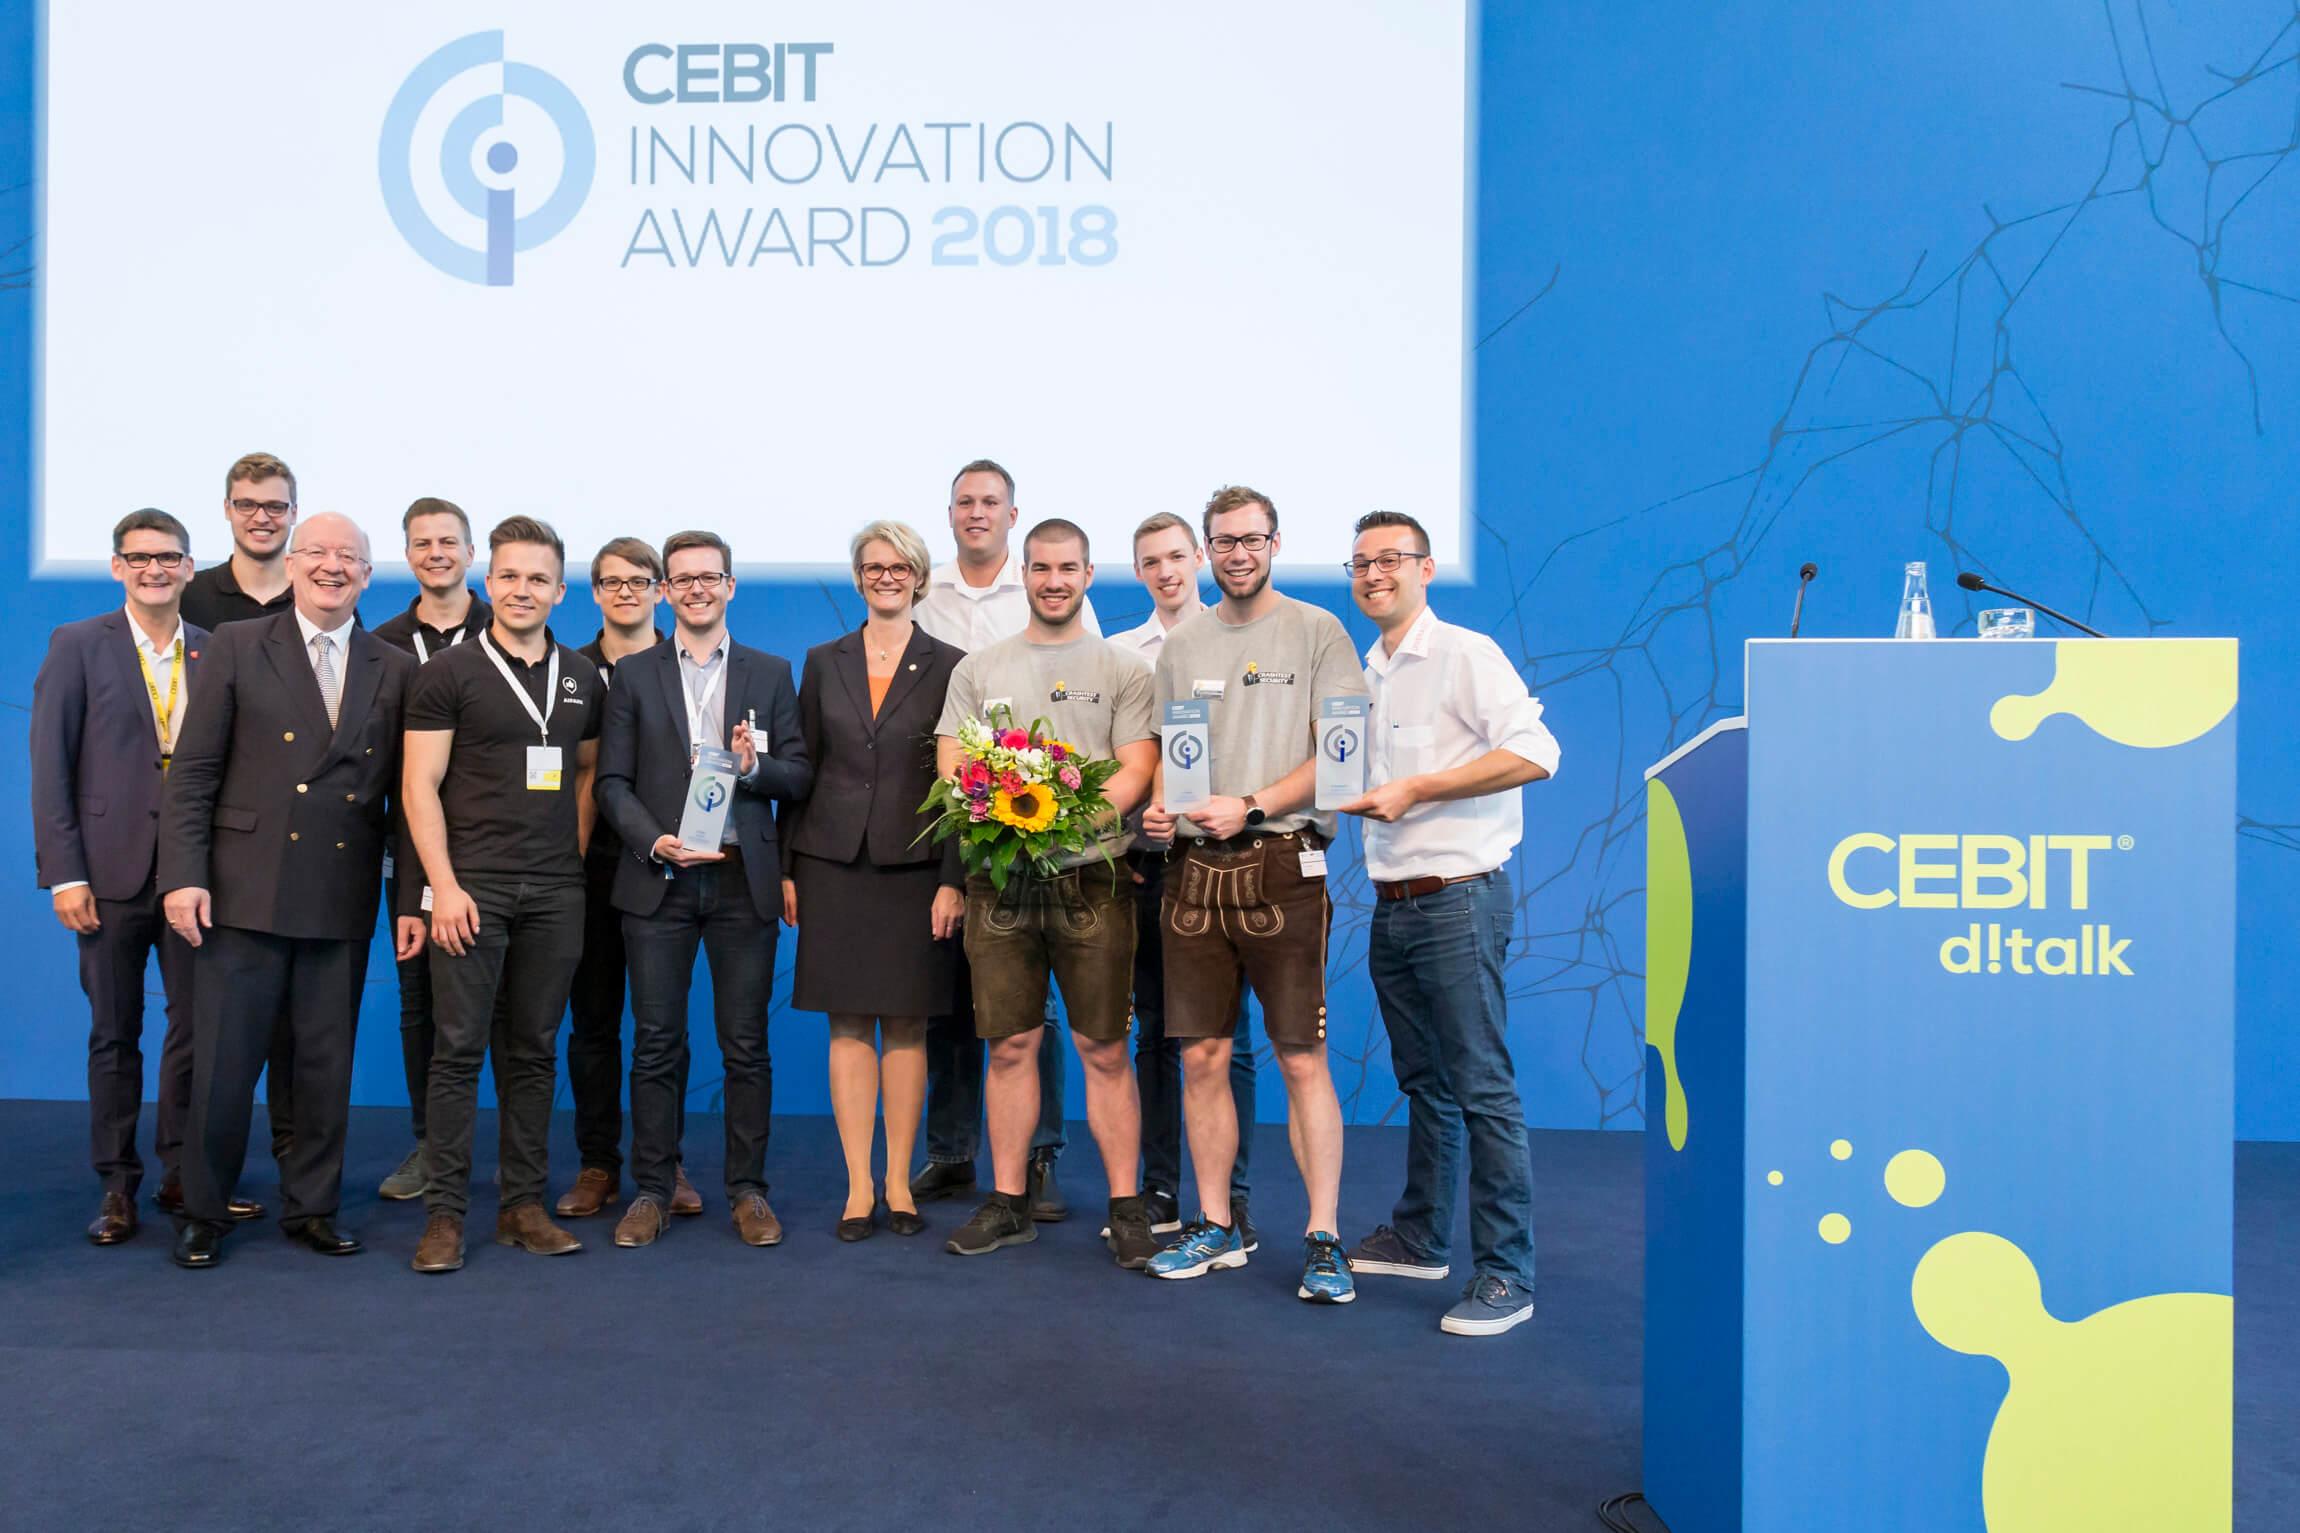 Preisträger des CEBIT Award 2018.